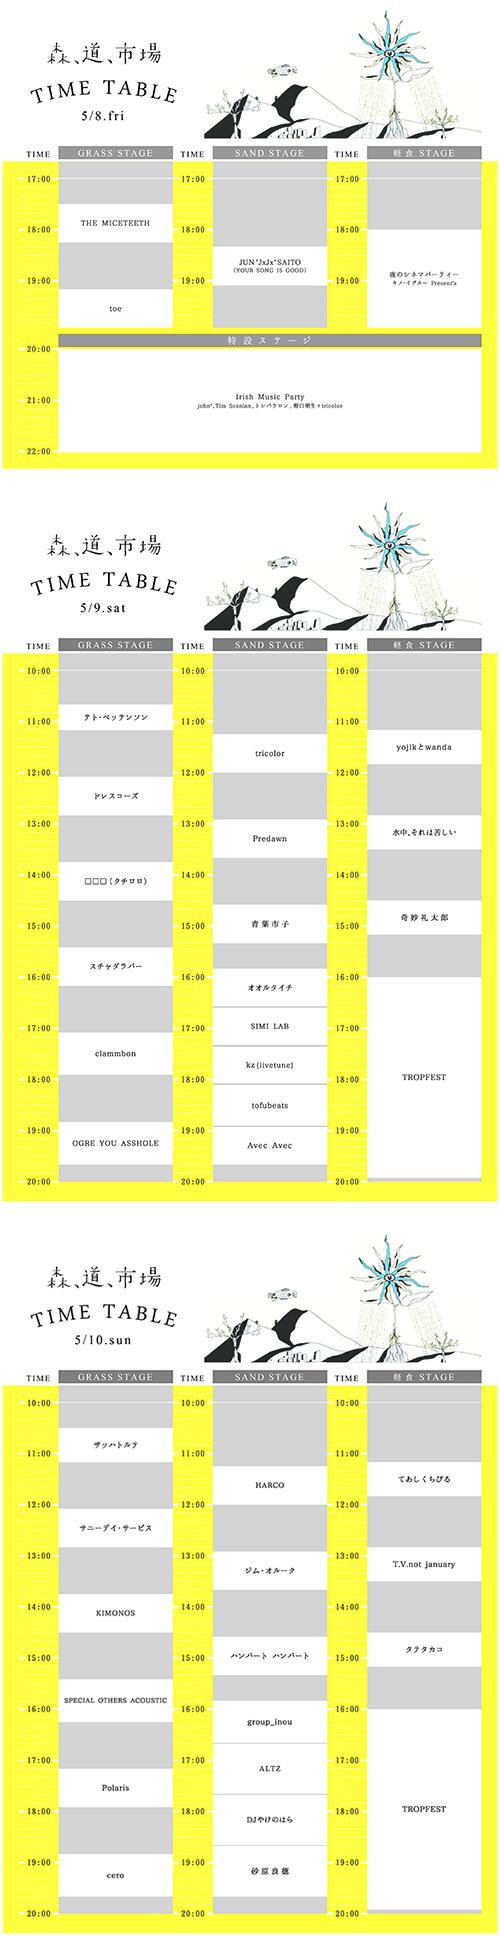 timetable_up.jpg